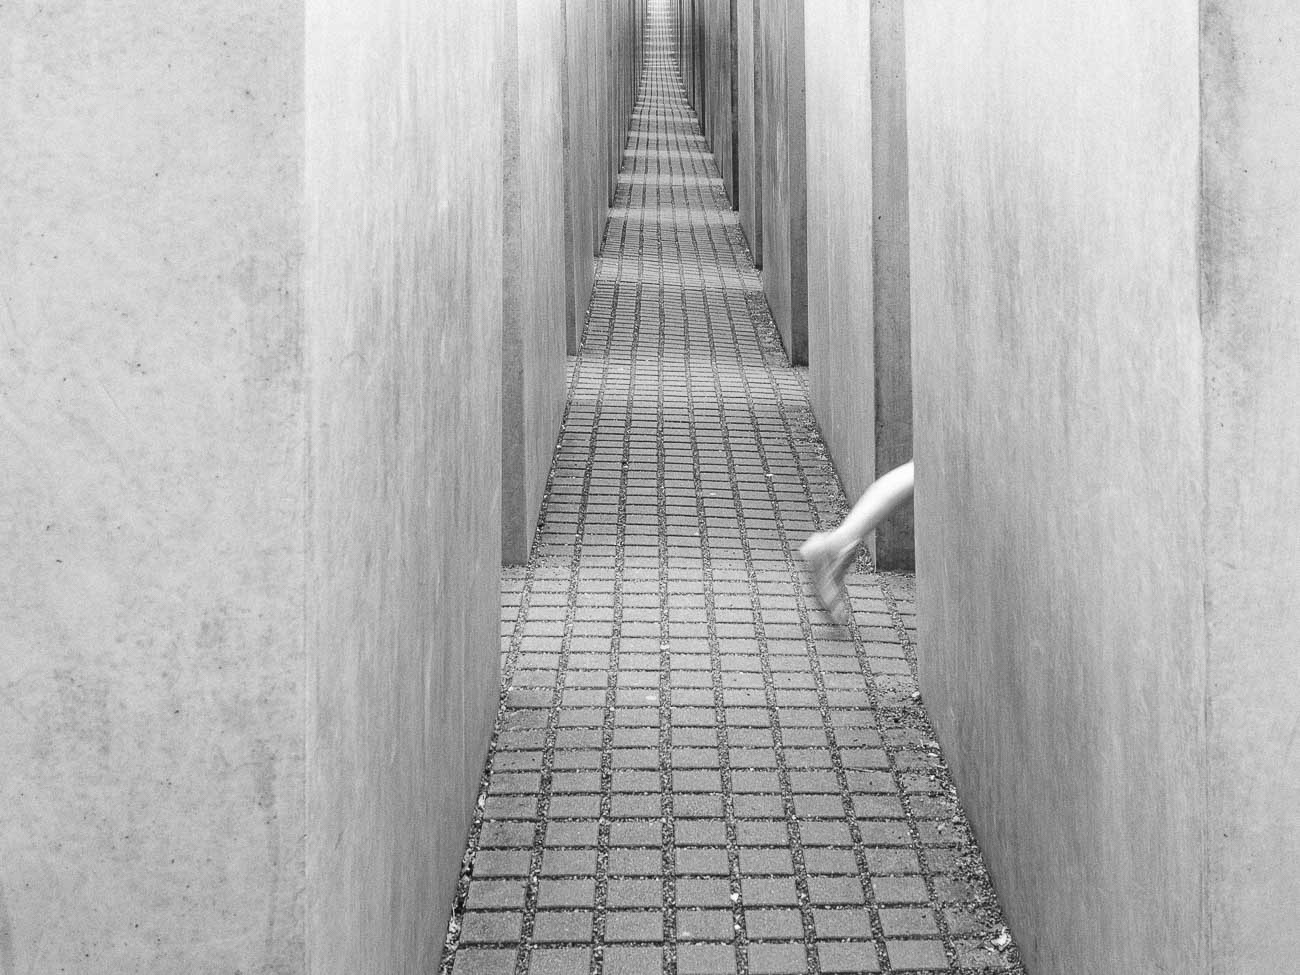 Street Photography Tips Martin U Waltz Berlin